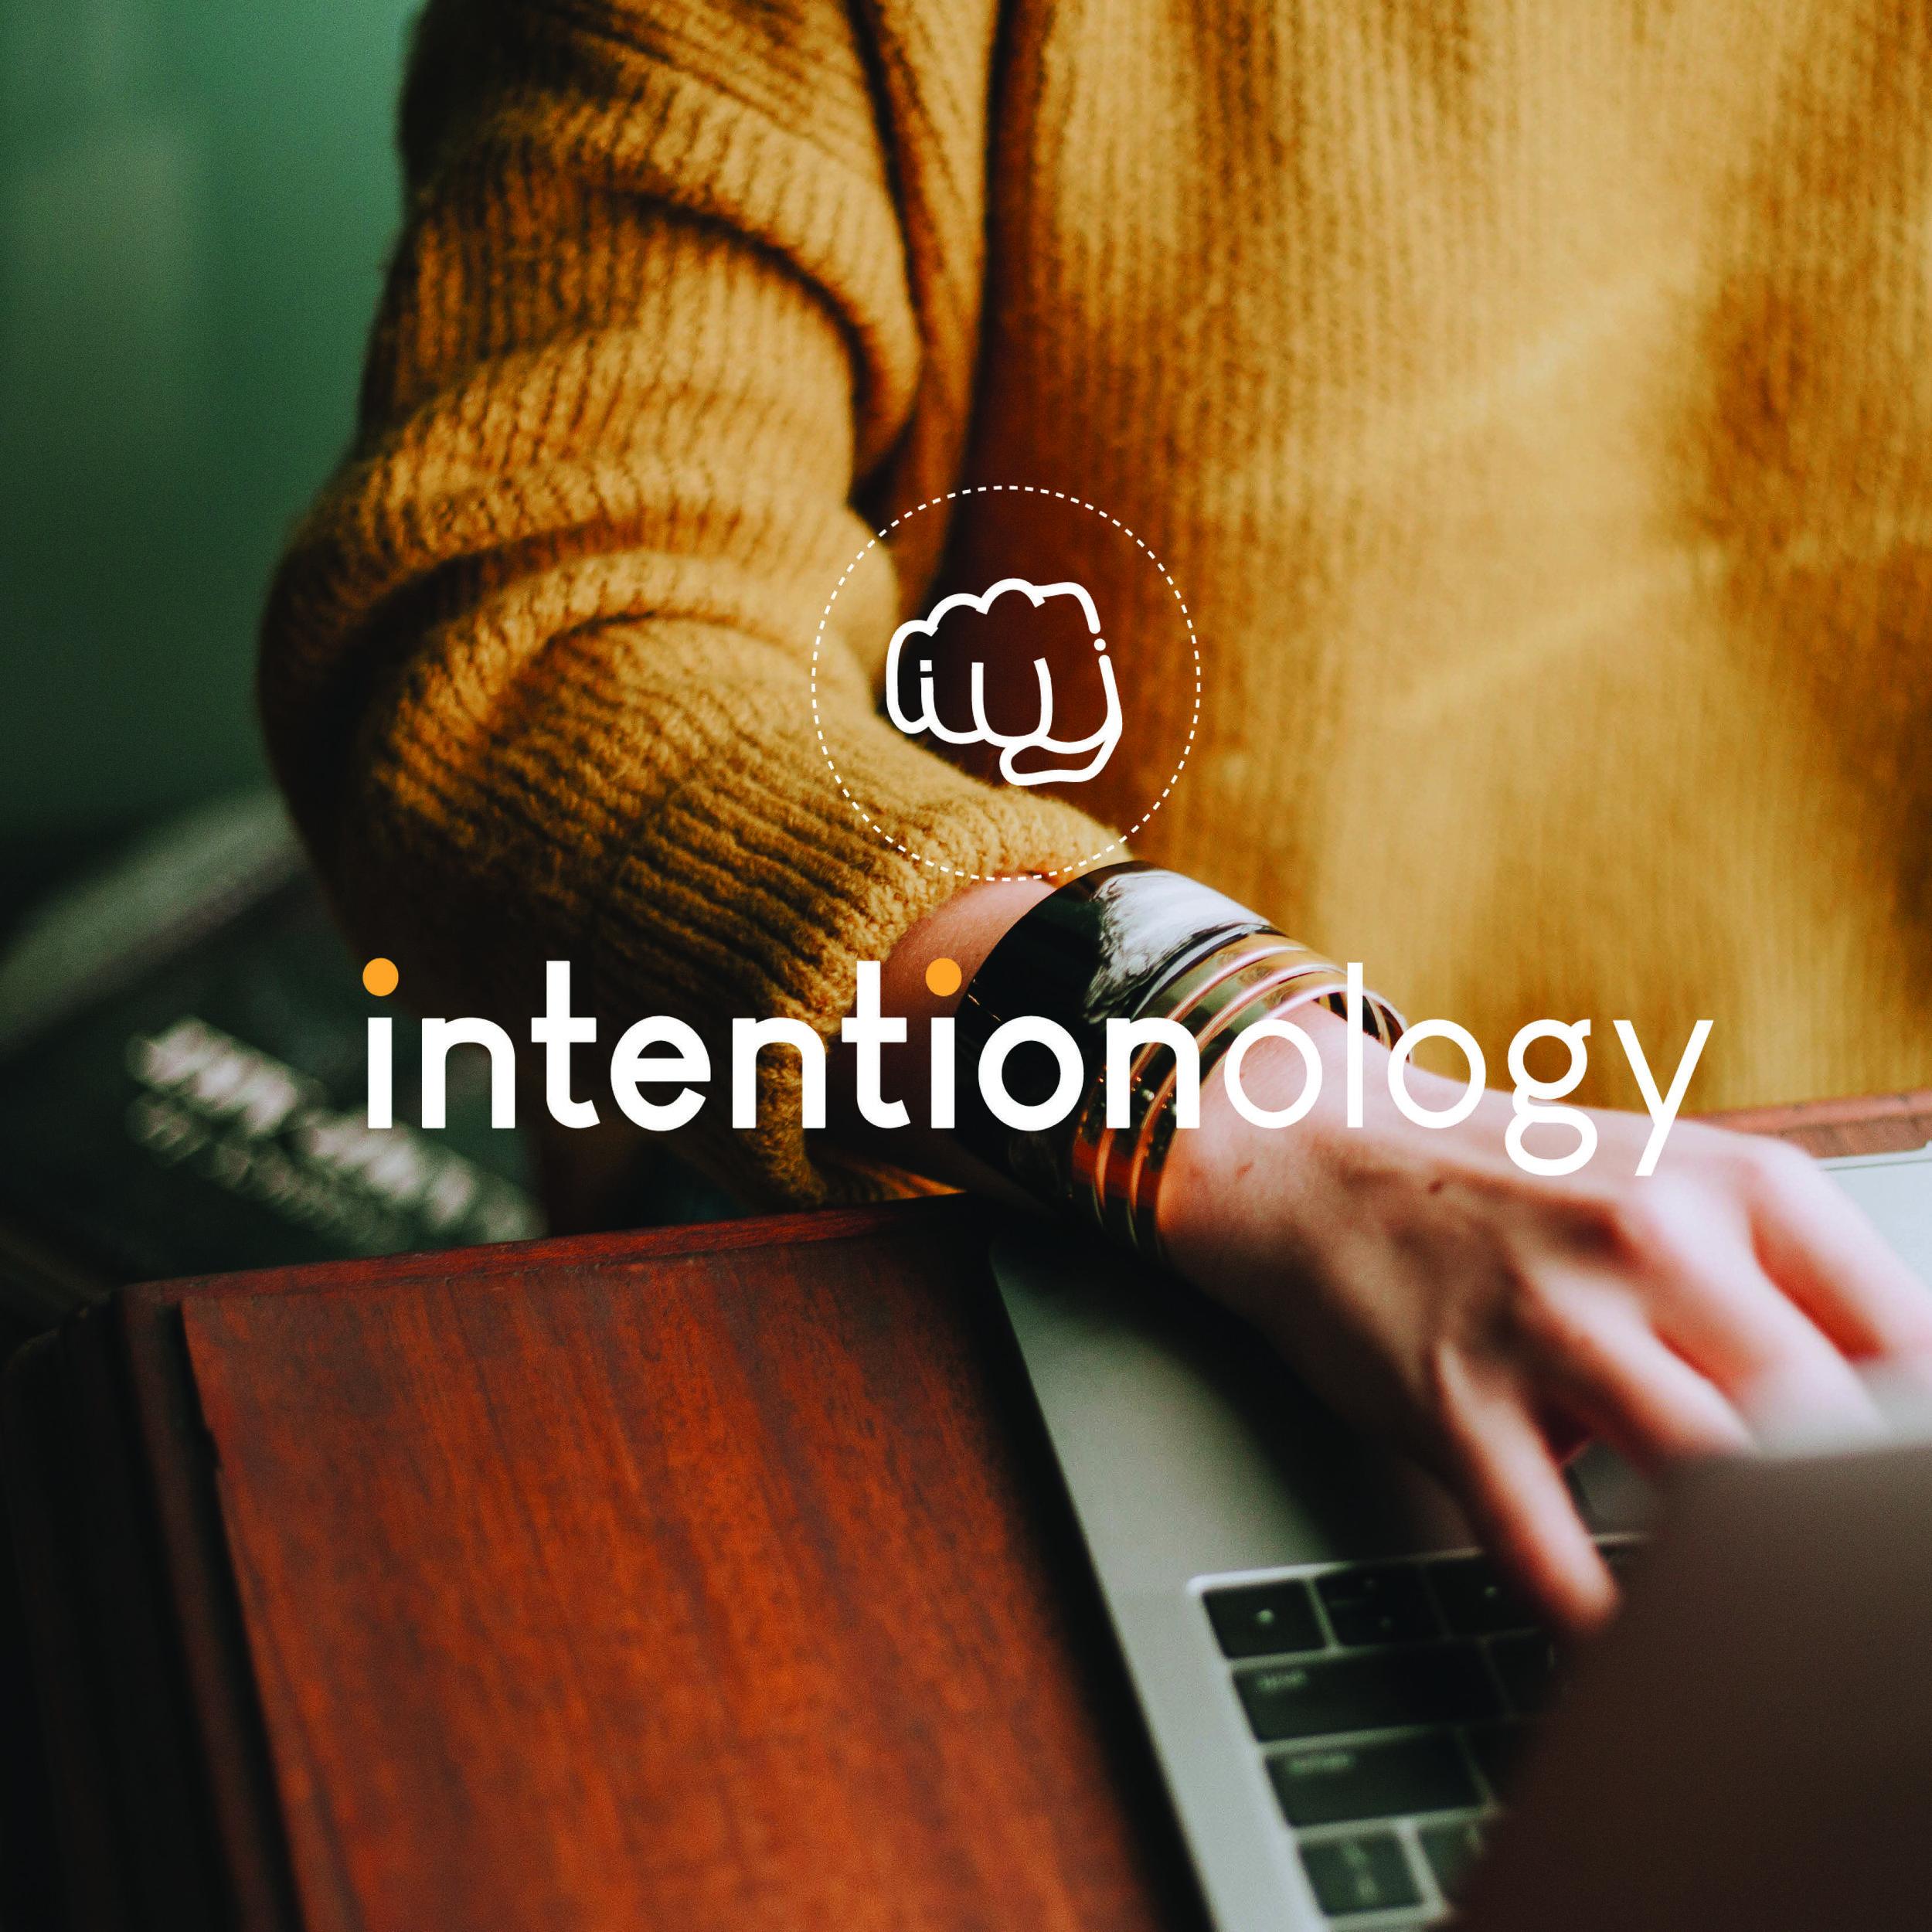 Intentionology-Brand6.jpg